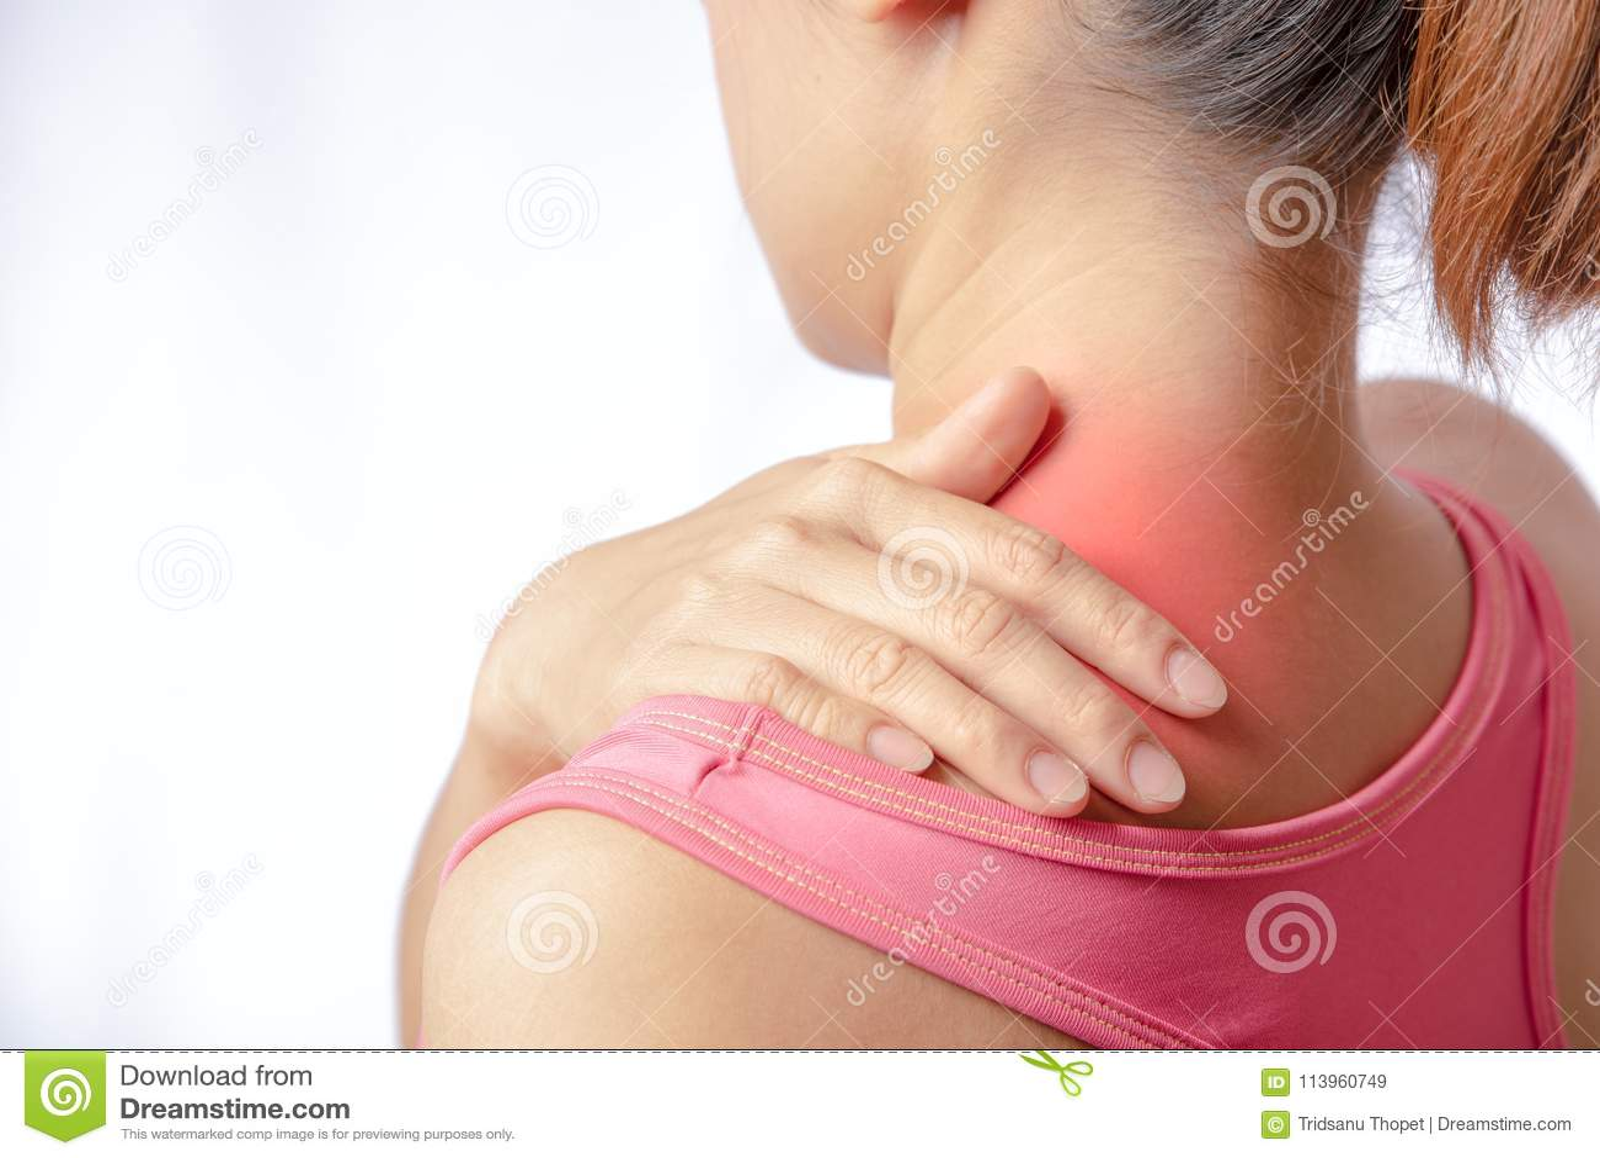 Hand touching trapezius muscle area